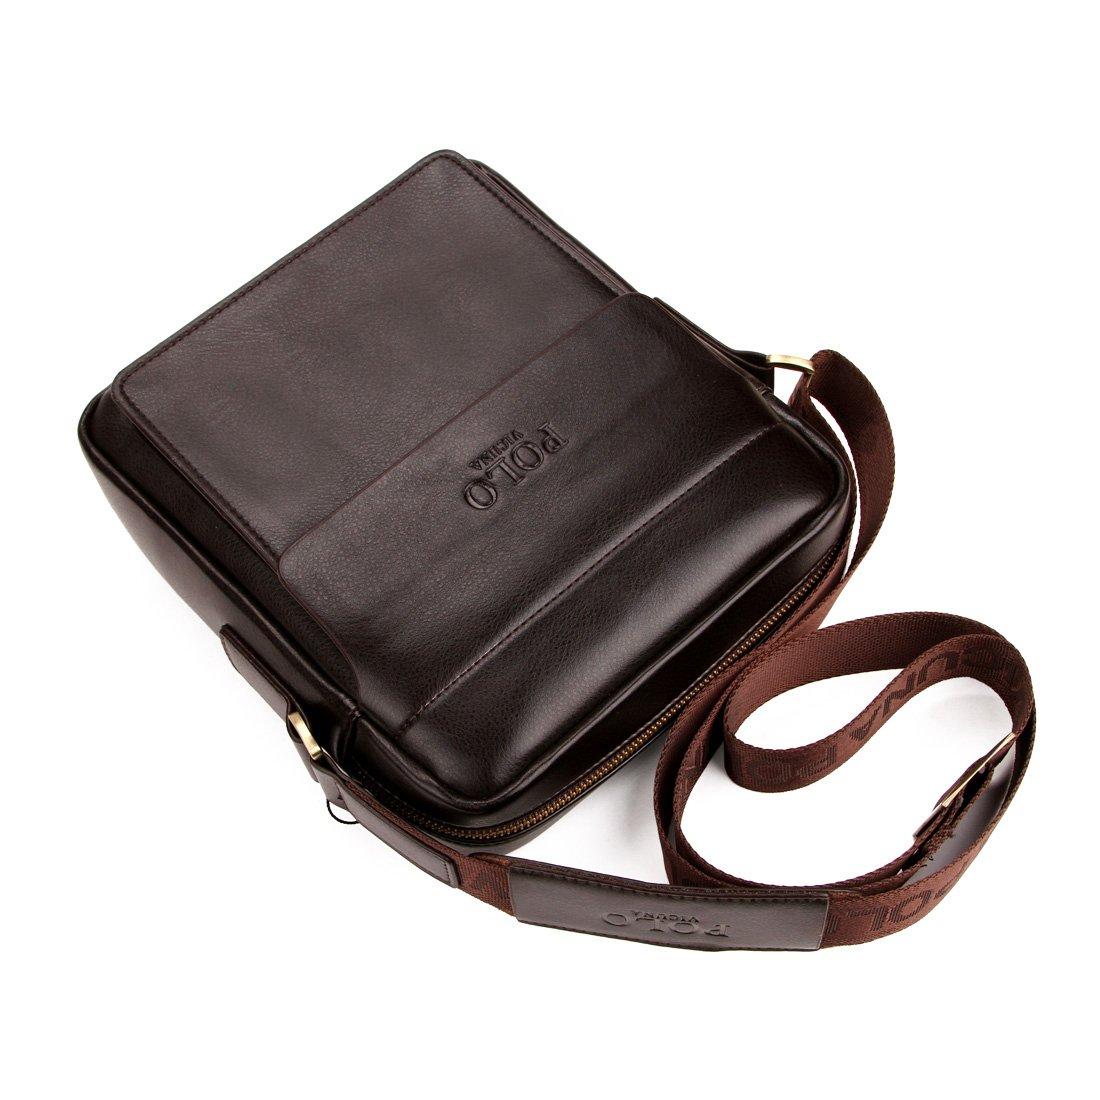 VICUNA POLO - Bolso bandolera marrón marrón 8.26*9.44*2.75inch ...